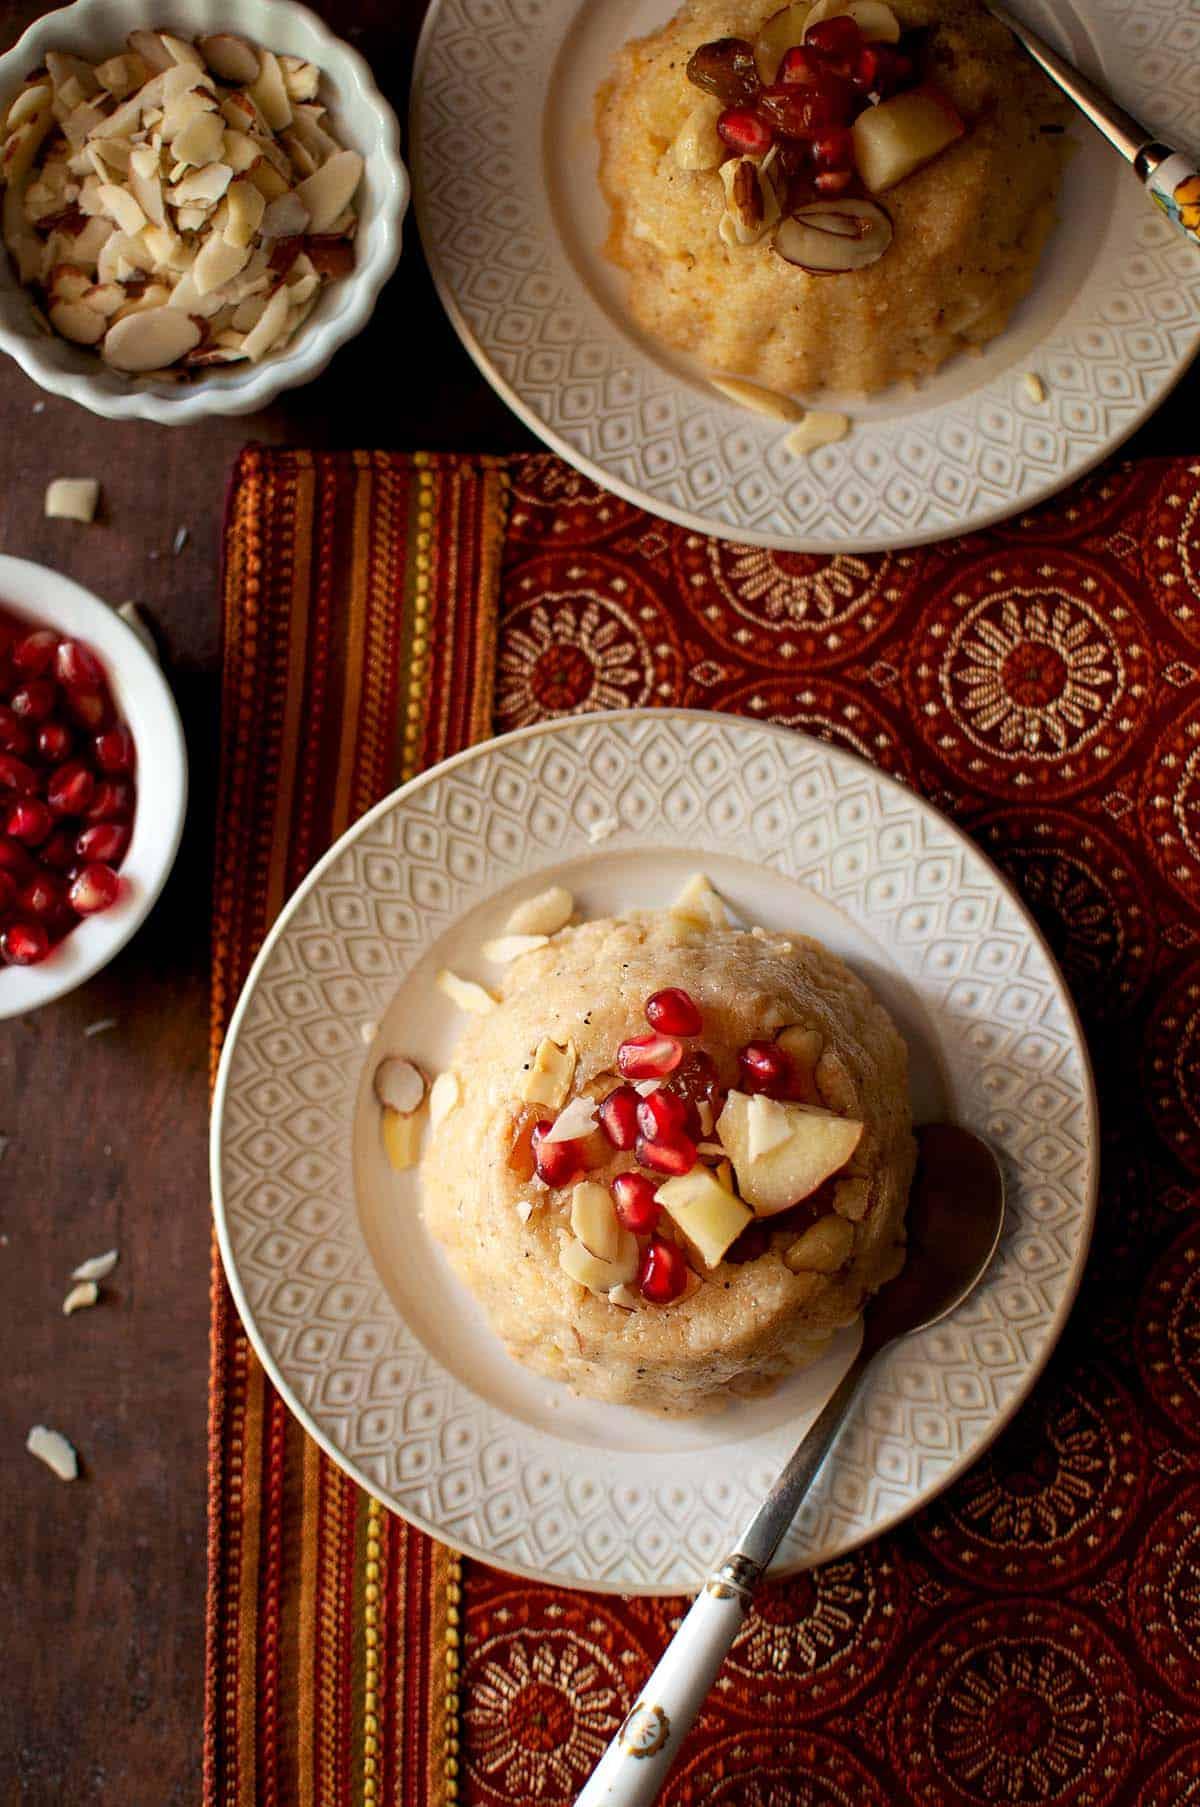 White plate with Jonna rava kesari topped with fruit